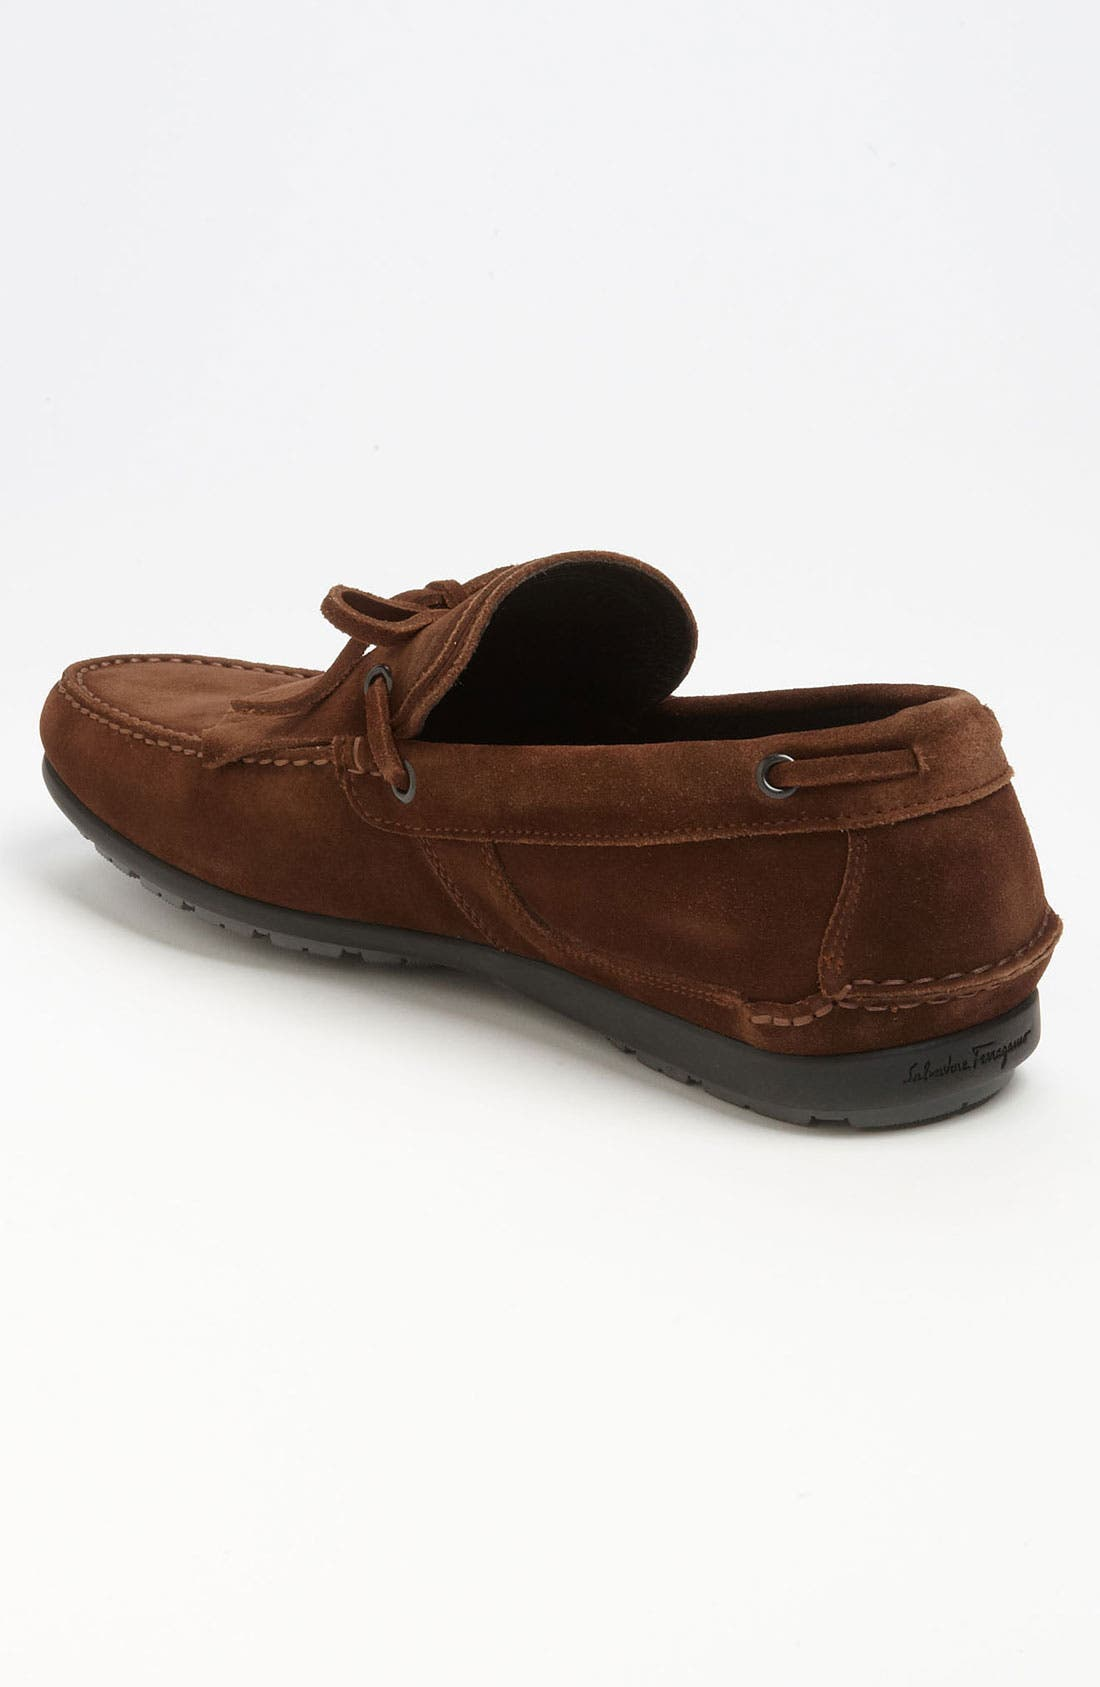 Alternate Image 2  - Salvatore Ferragamo 'Albero' Kiltie Driving Shoe